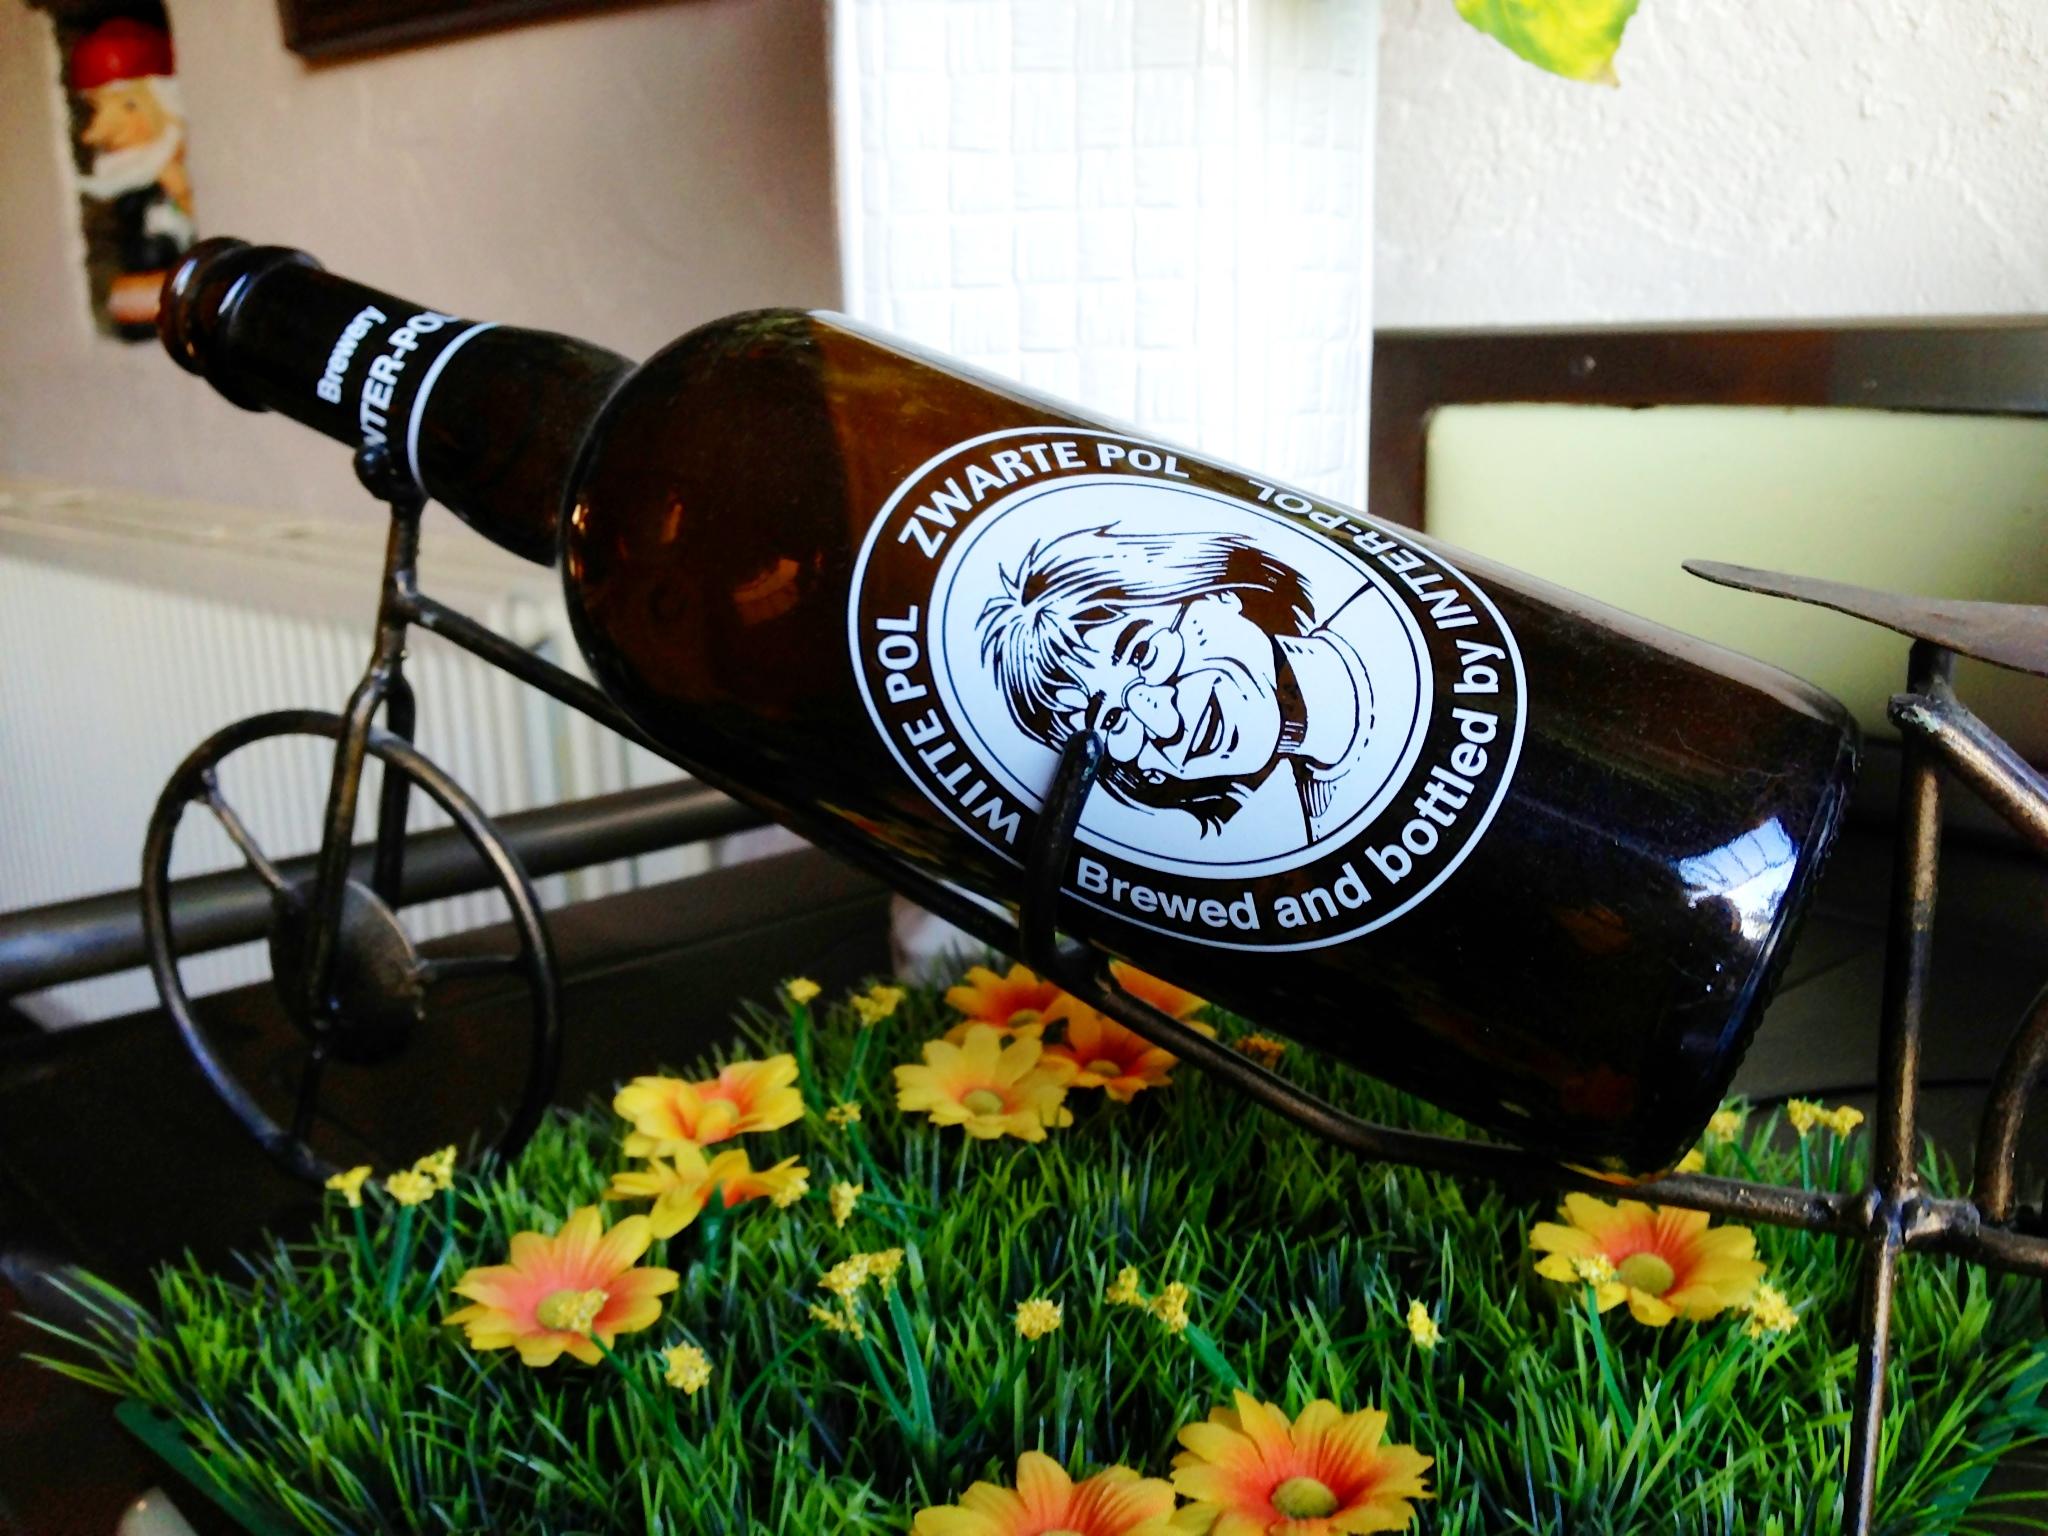 InterPol Brewry atLa Vieille Forge